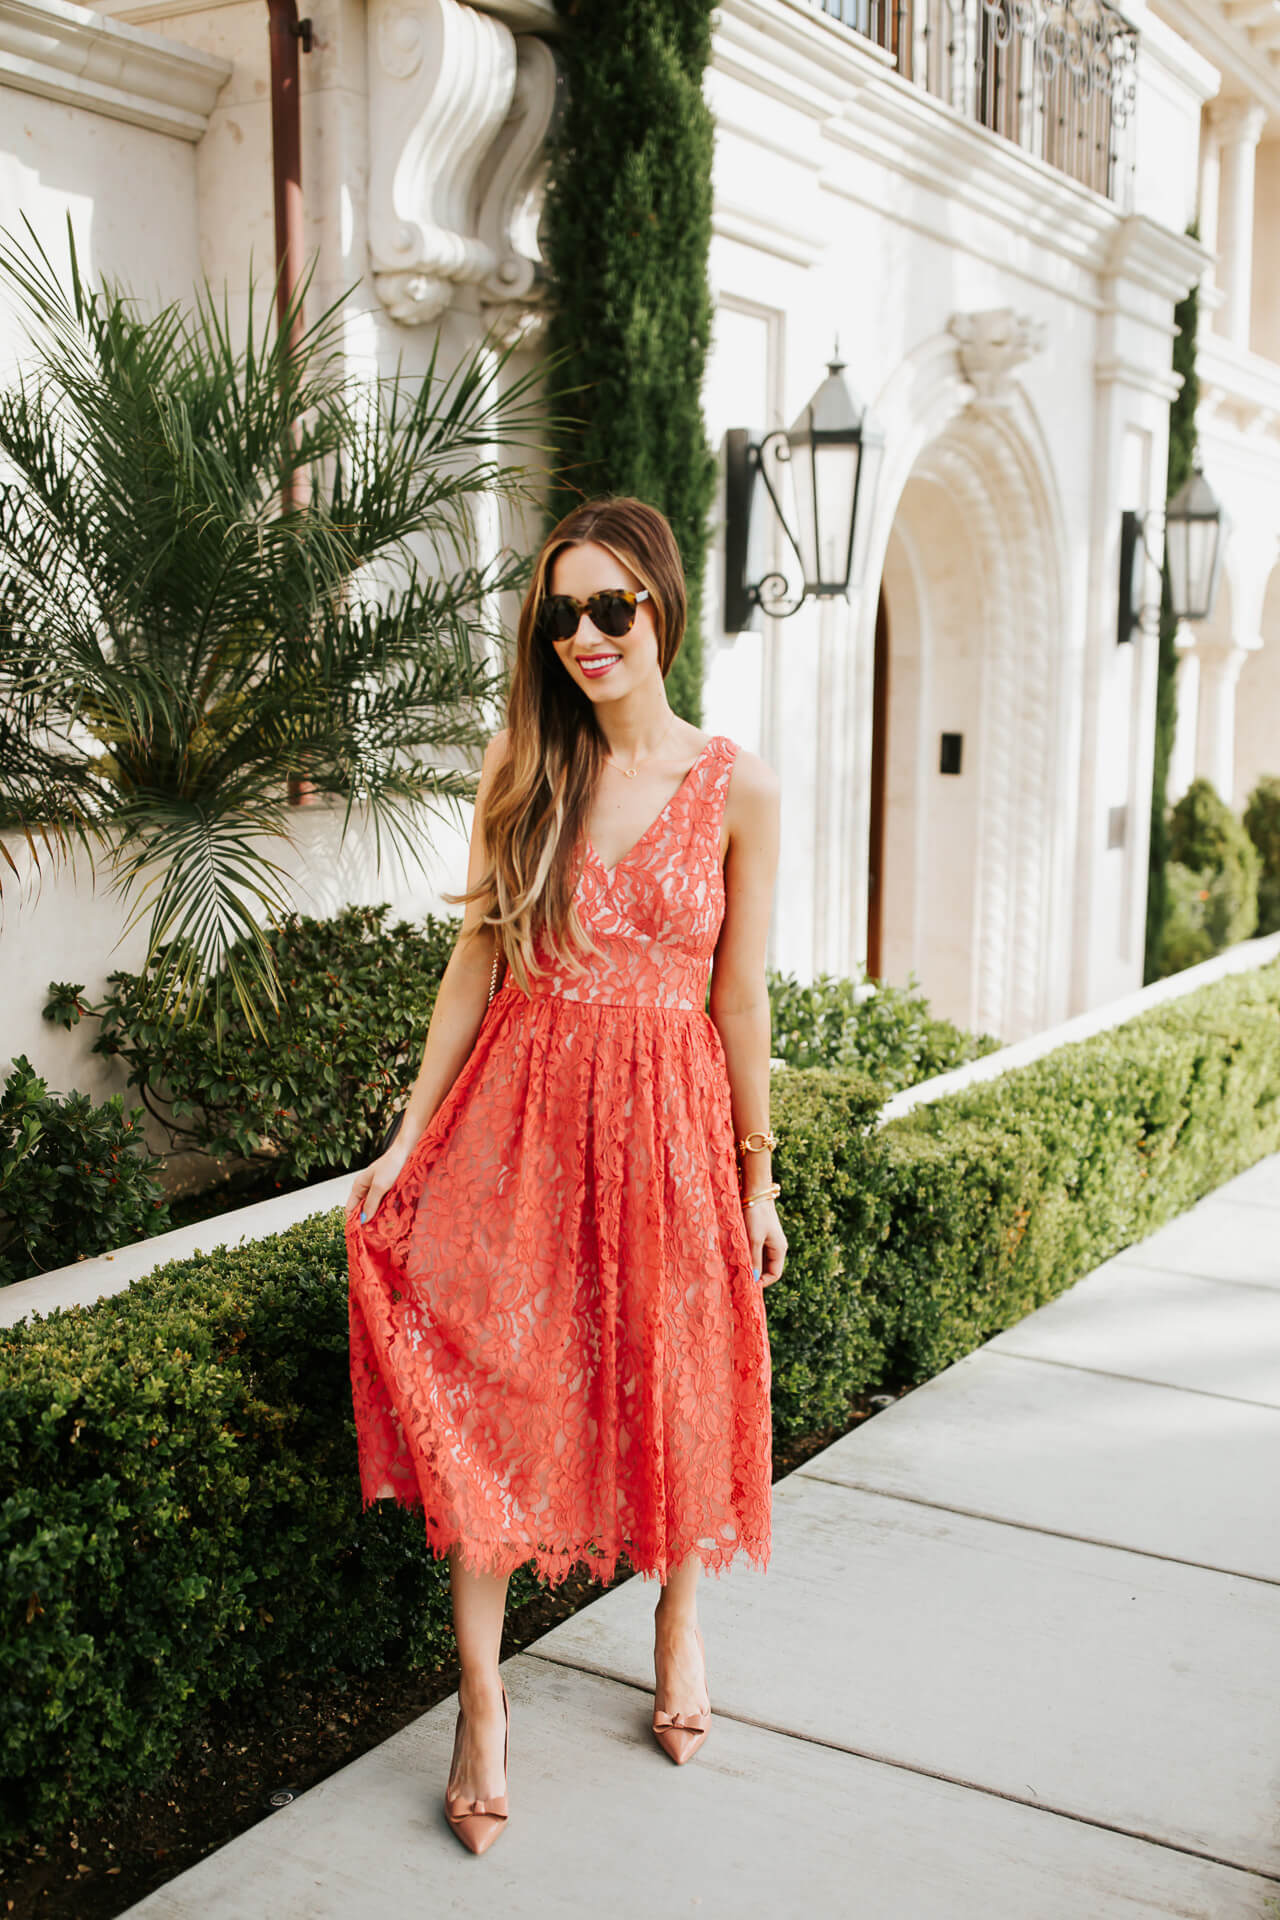 The prettiest romantic lace dresses. | M Loves M @marmar